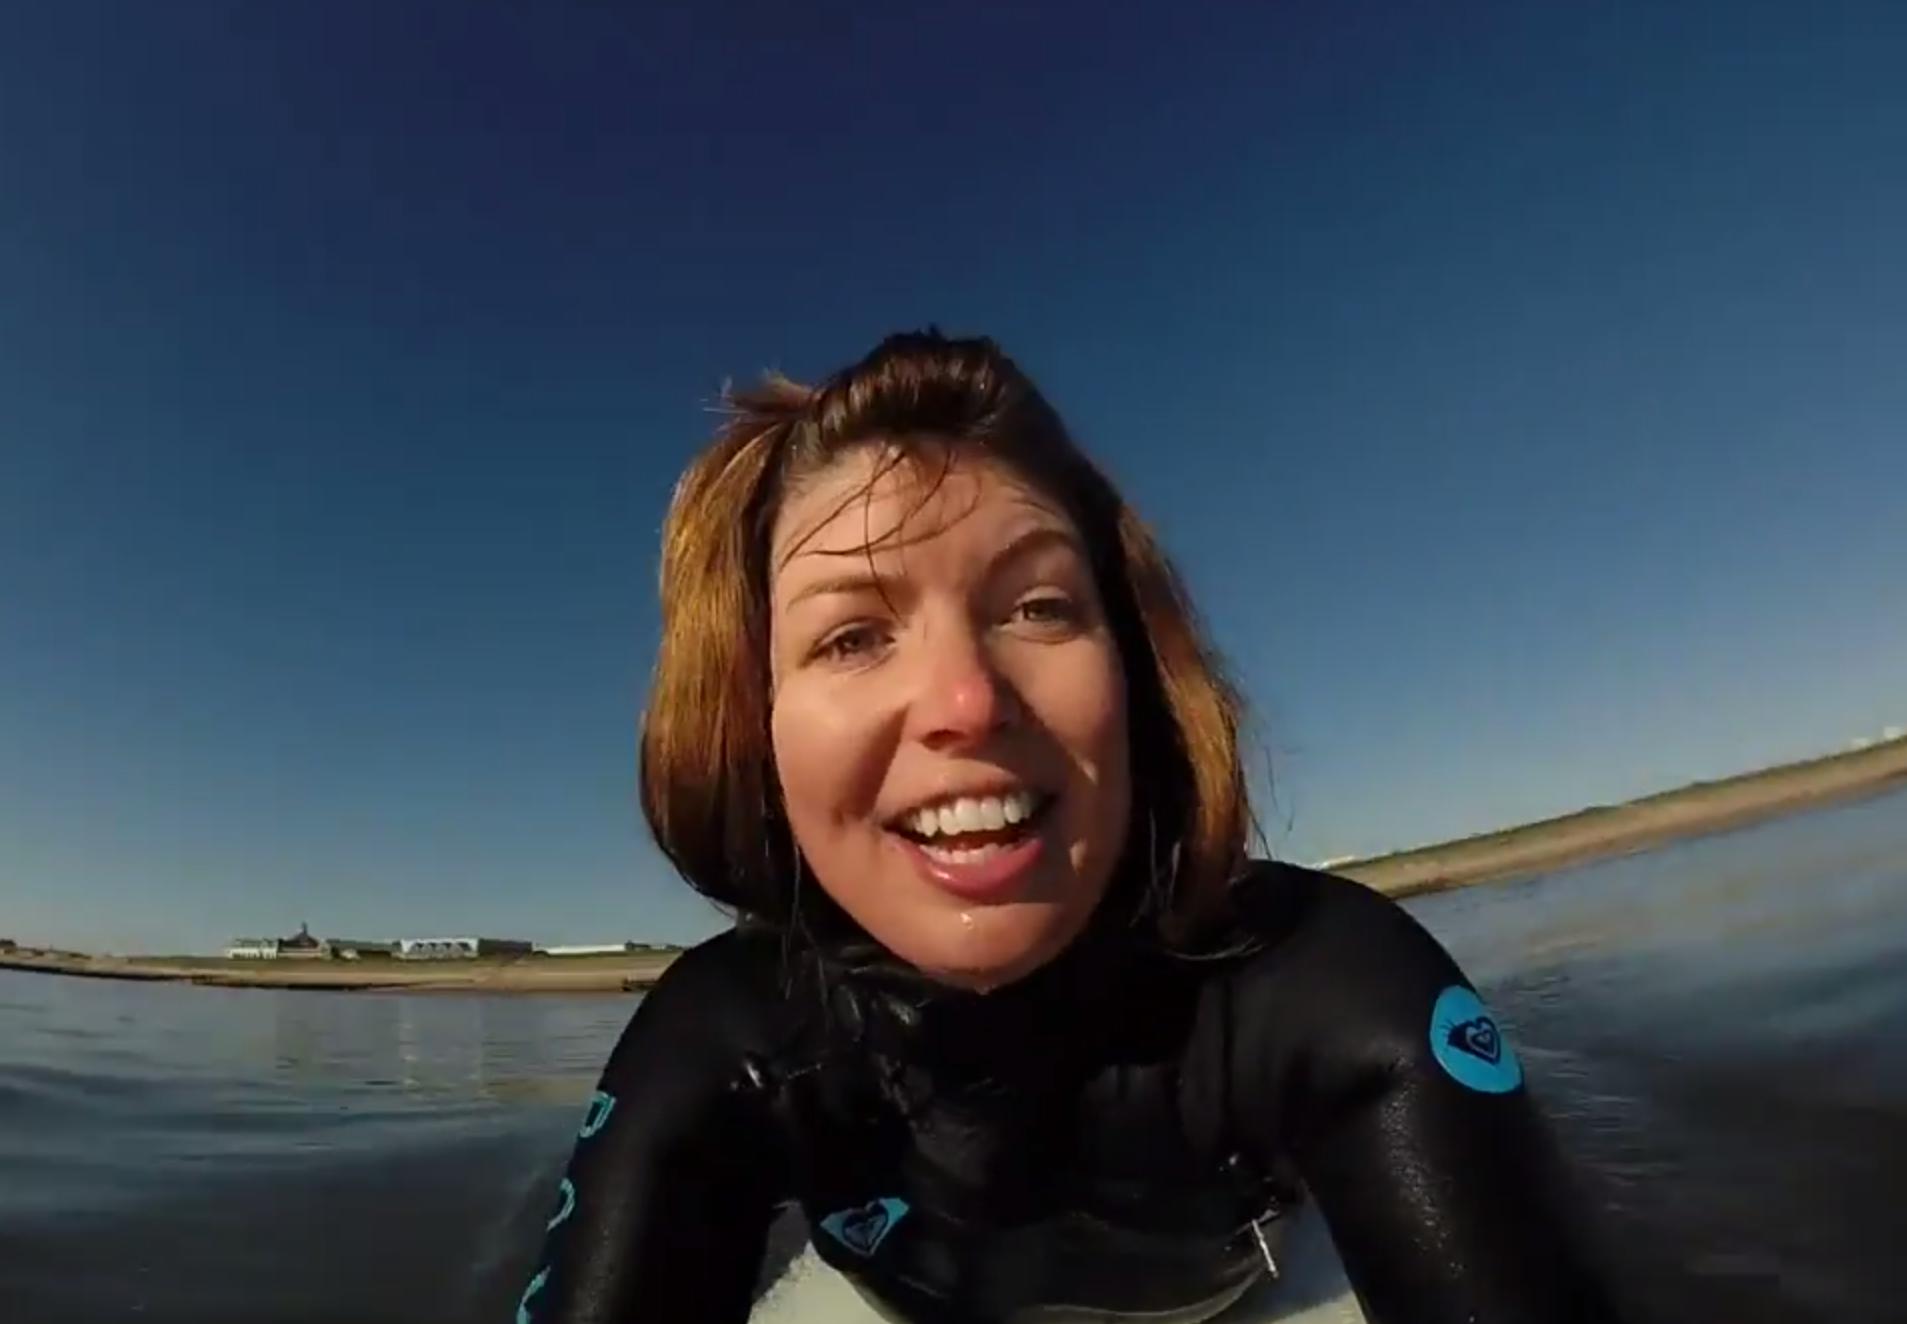 Aberdeen surfer Katie Watson